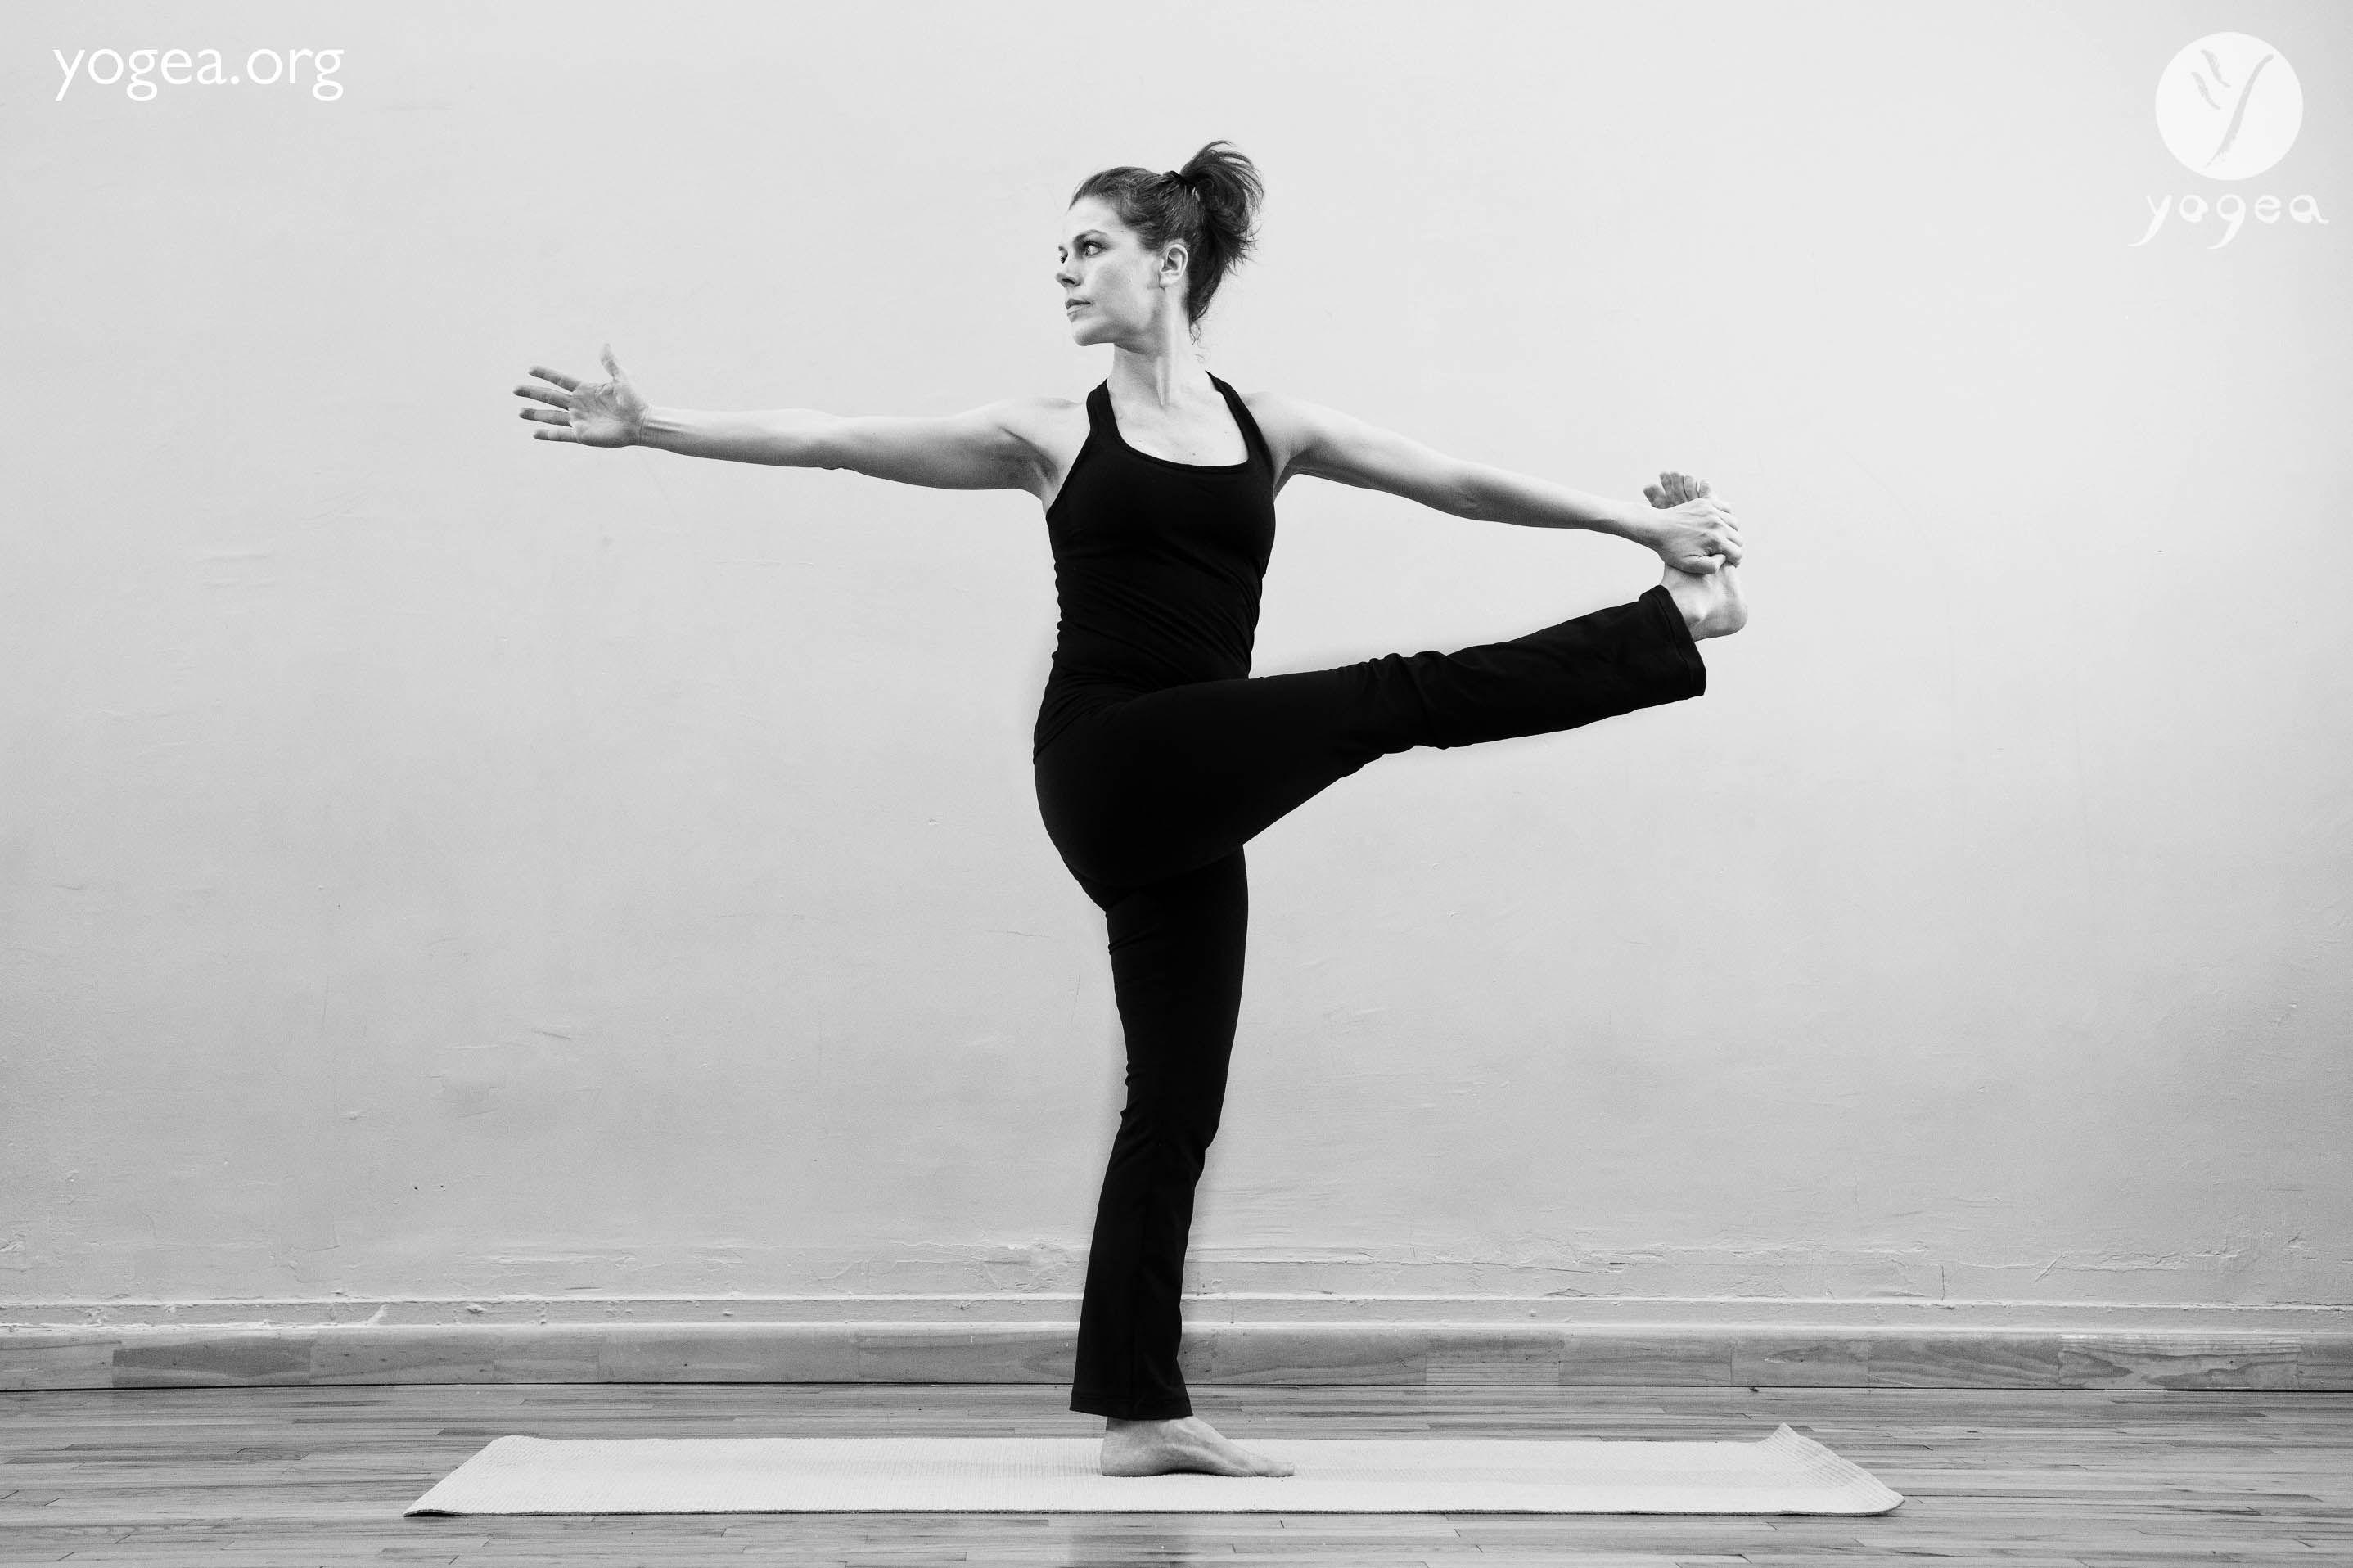 Urdhva Jathara Parivartanasana – Standing bound spinal twist